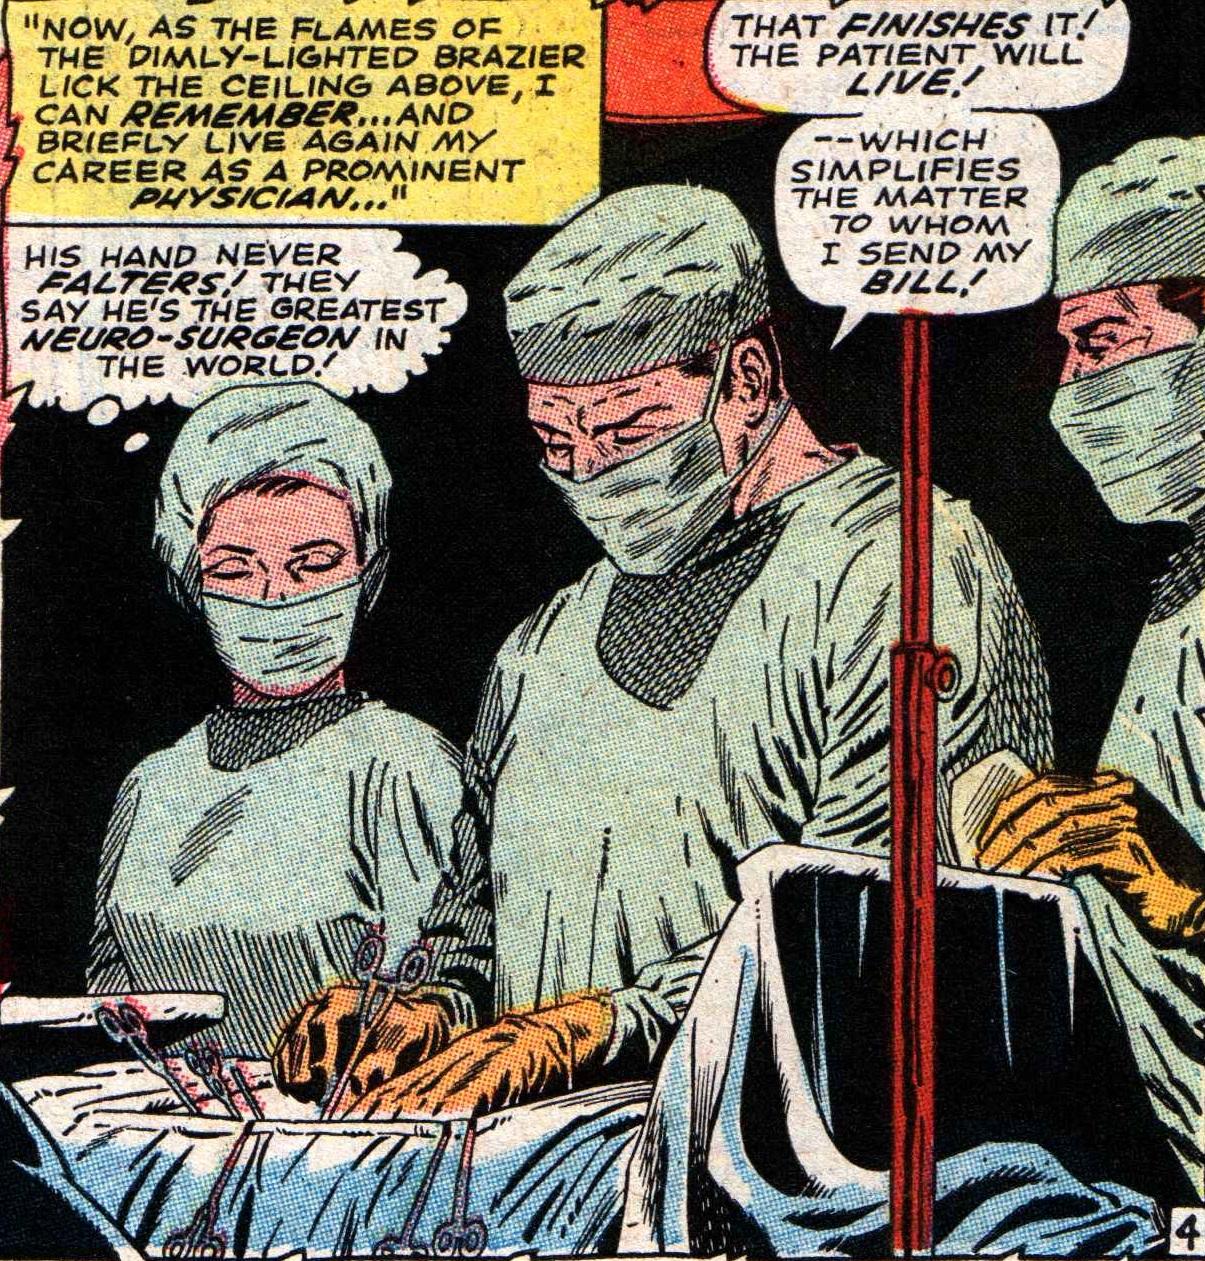 stephen_strange_earth-616_performs_surgery_in_doctor_strange_vol_1_169